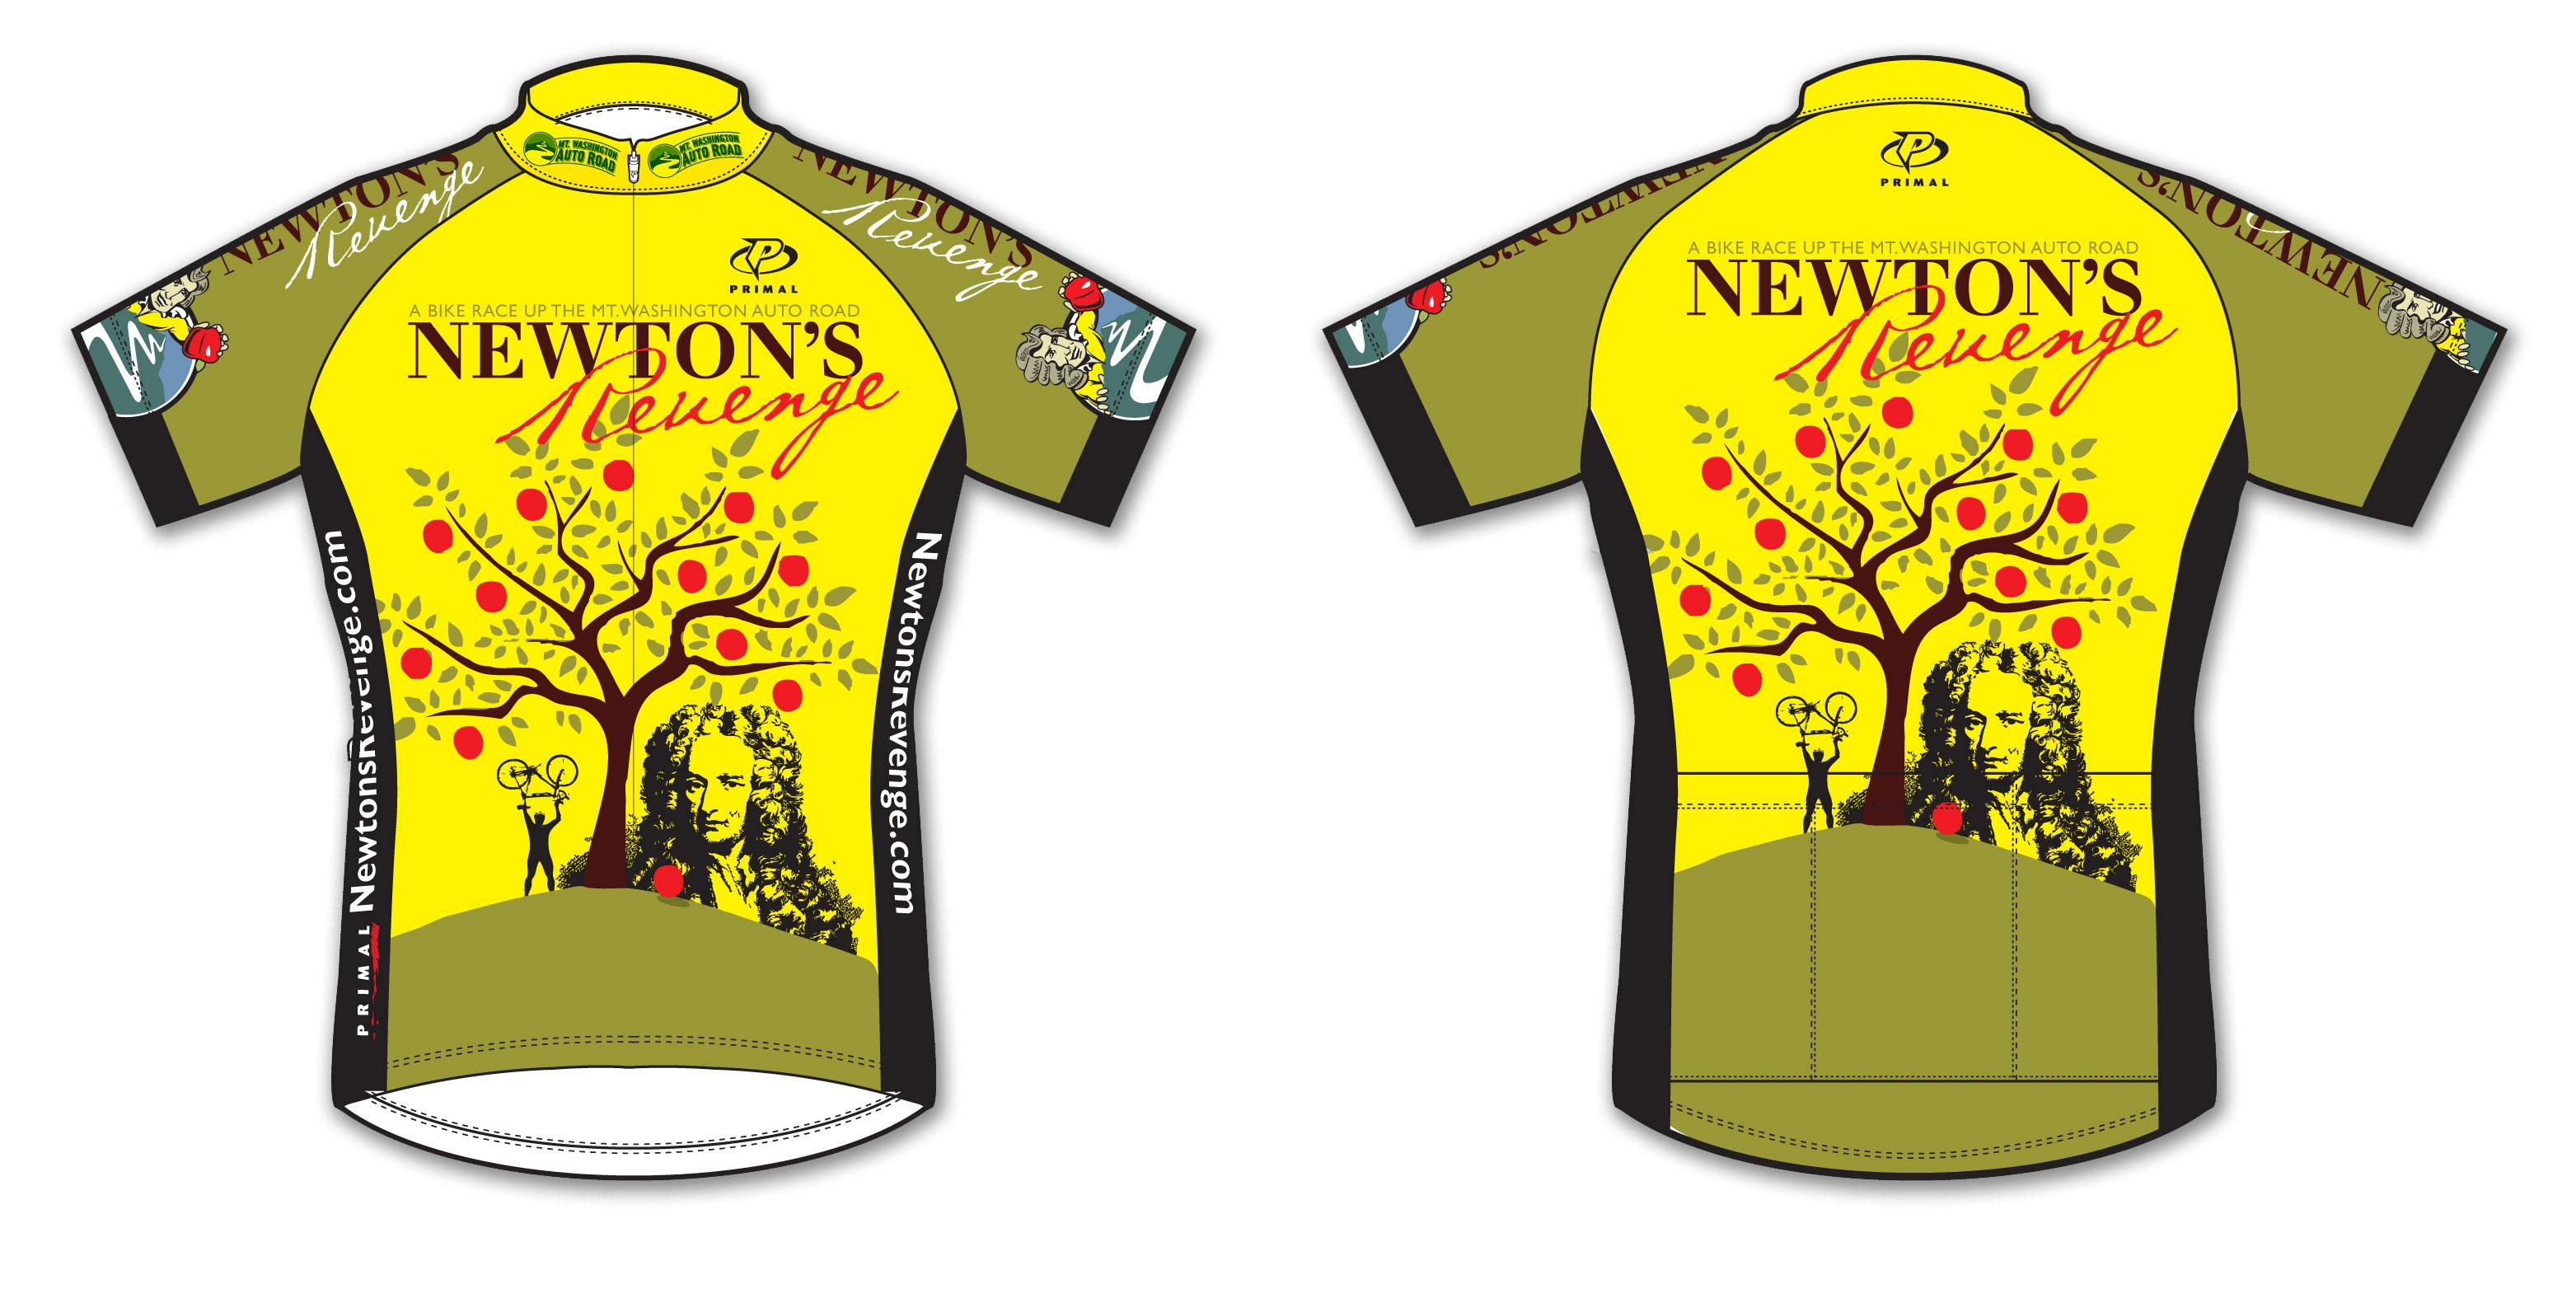 Newtons Revenge jersey 2013